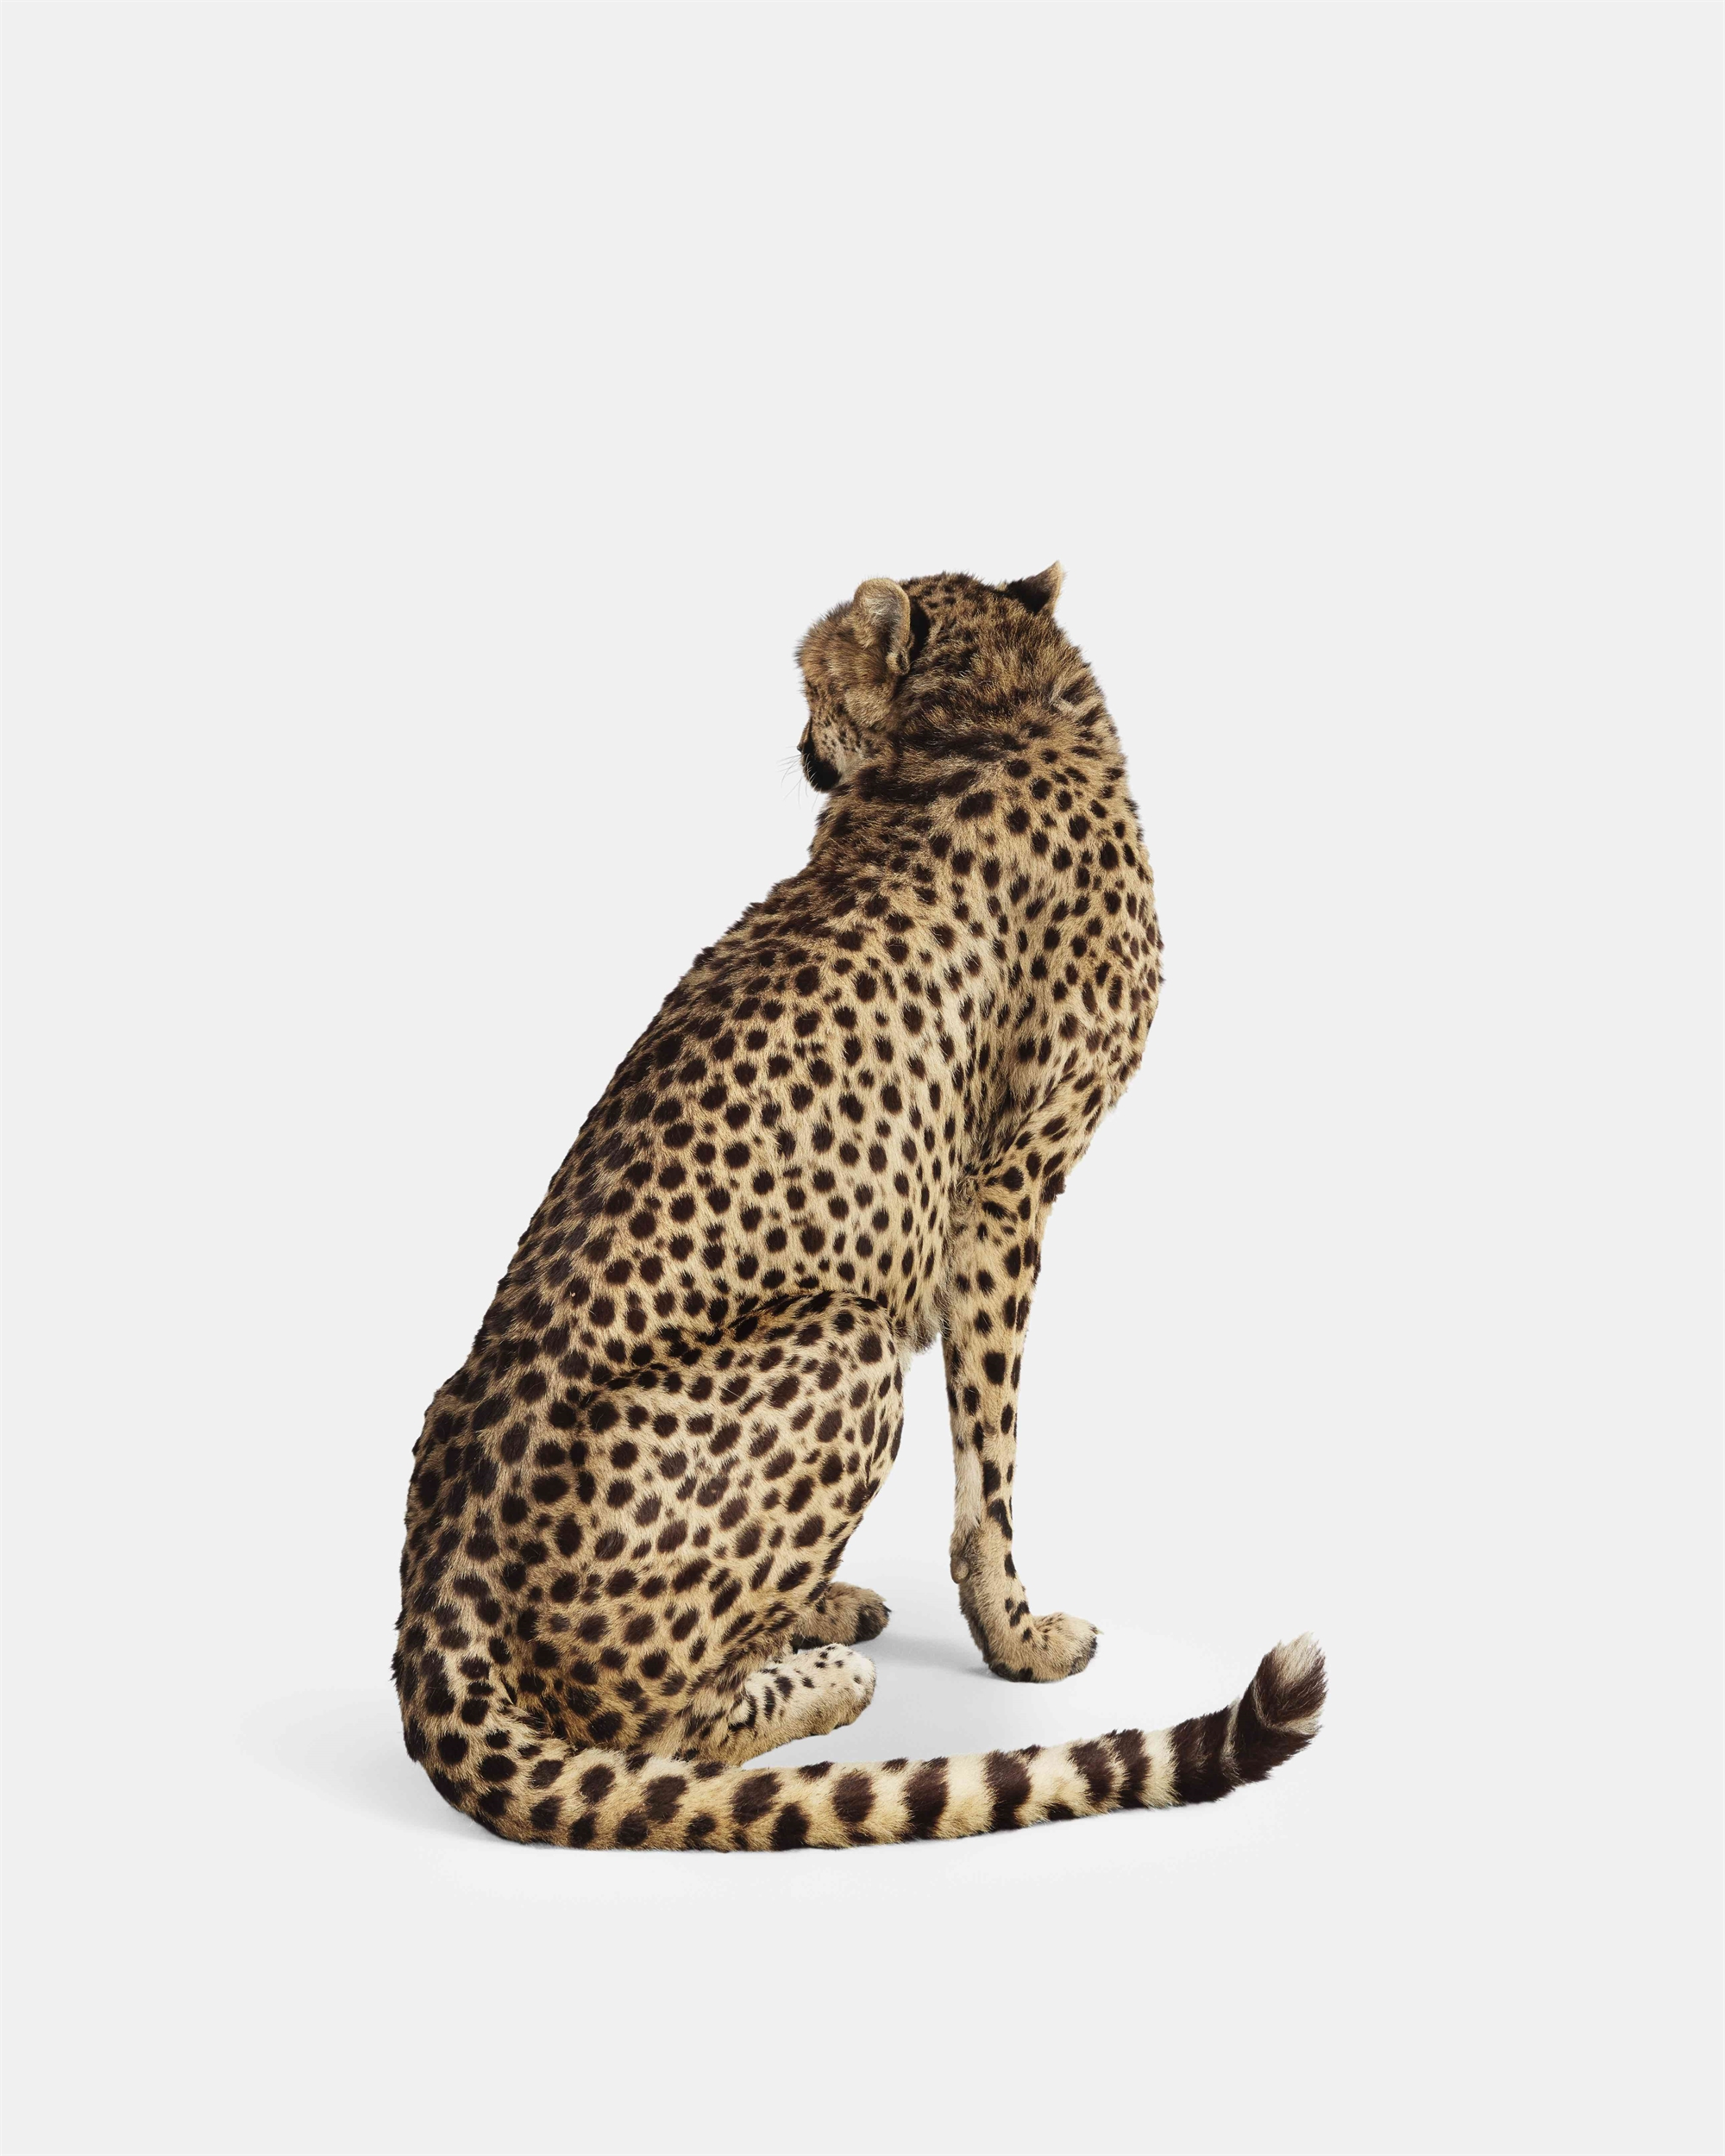 Cheetah No. II by Randal Ford